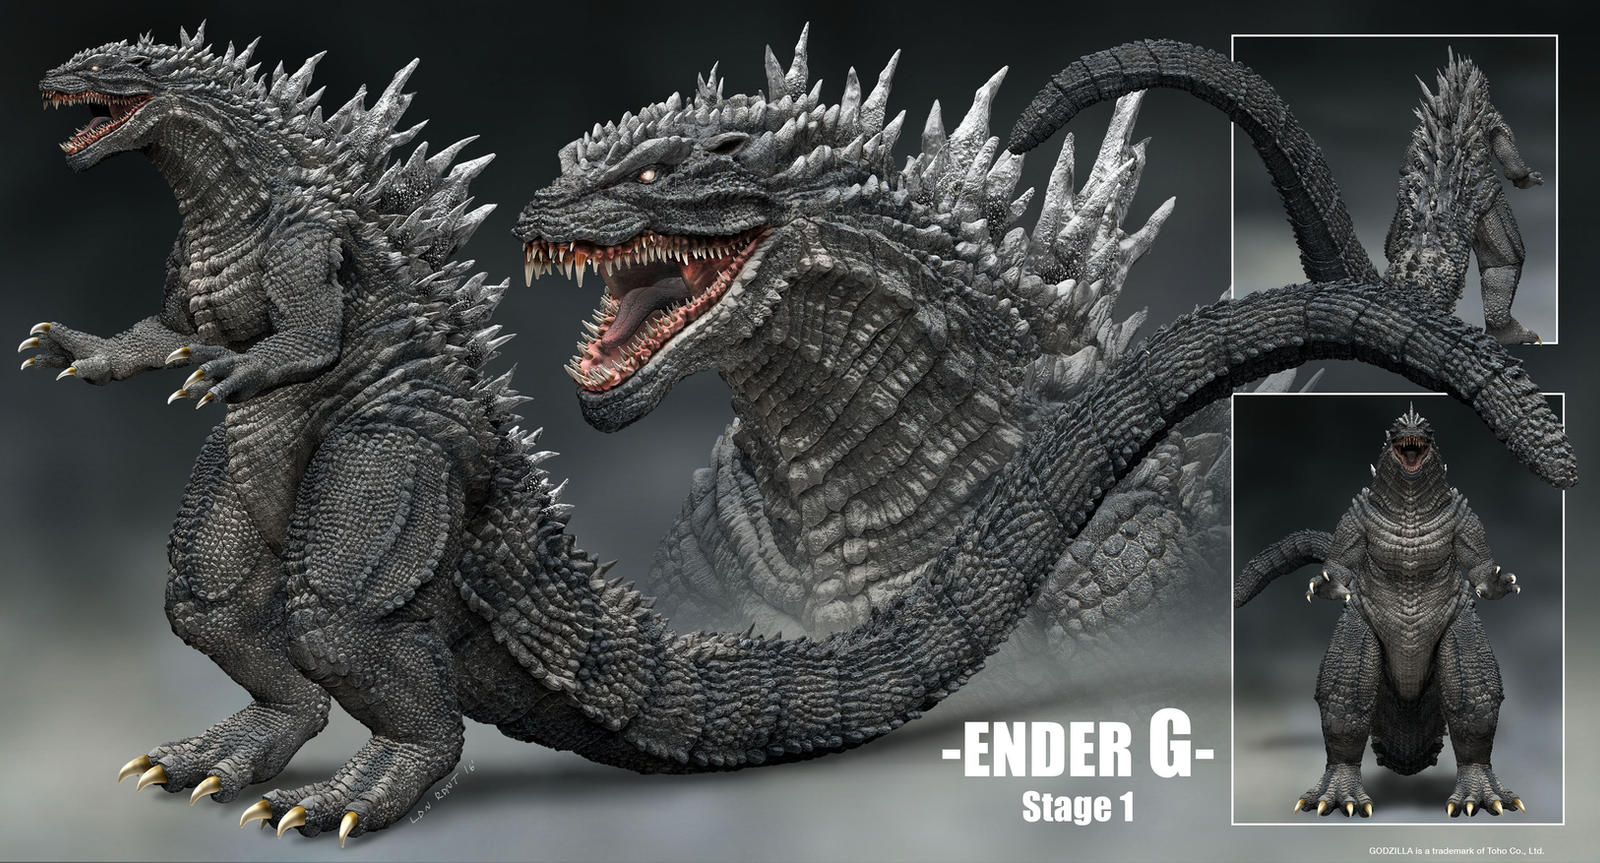 -Ender G-